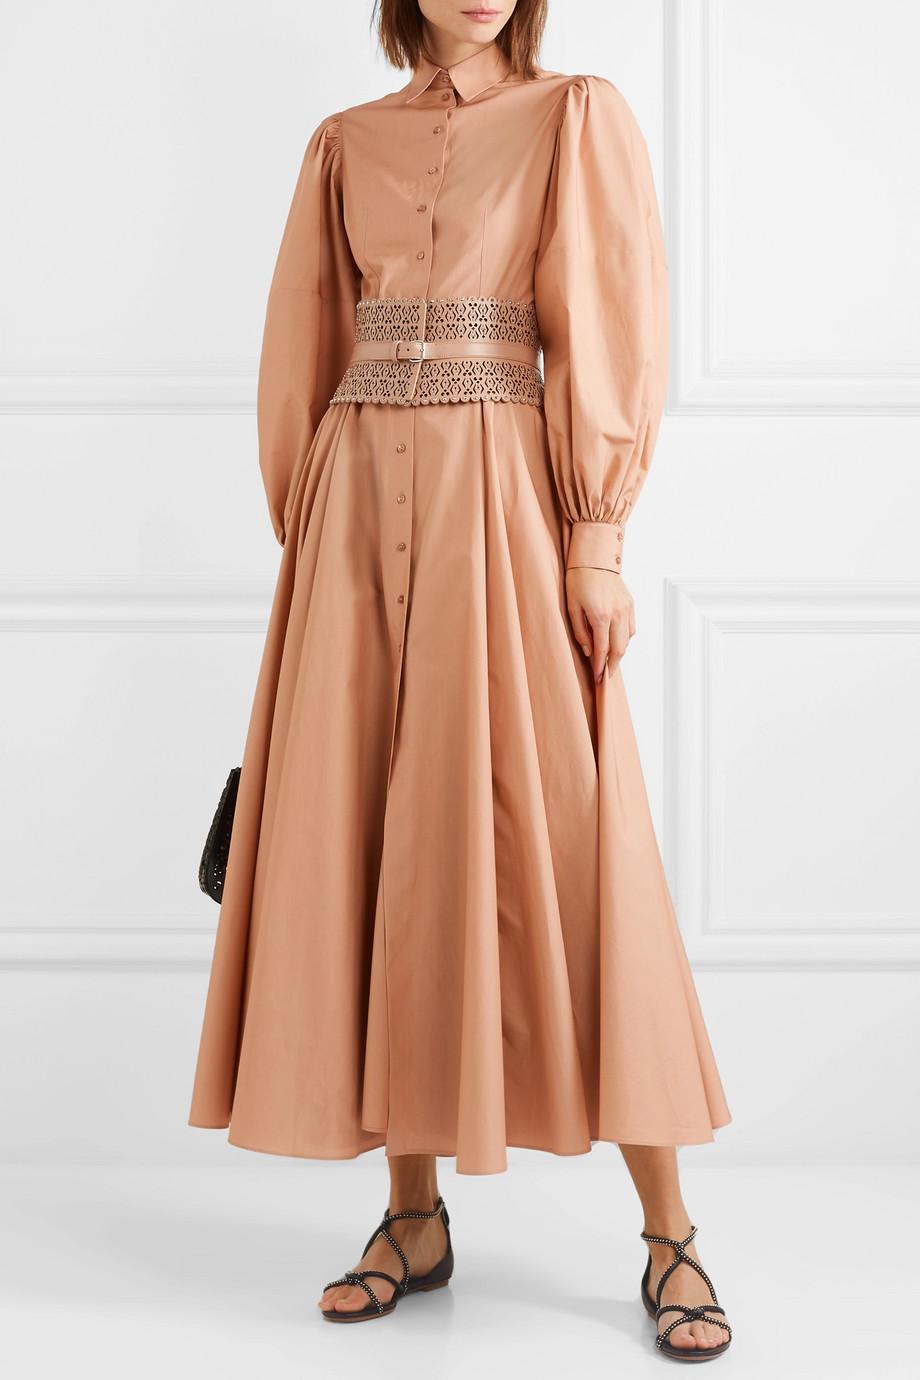 Alaïa Pleated cotton-poplin dress